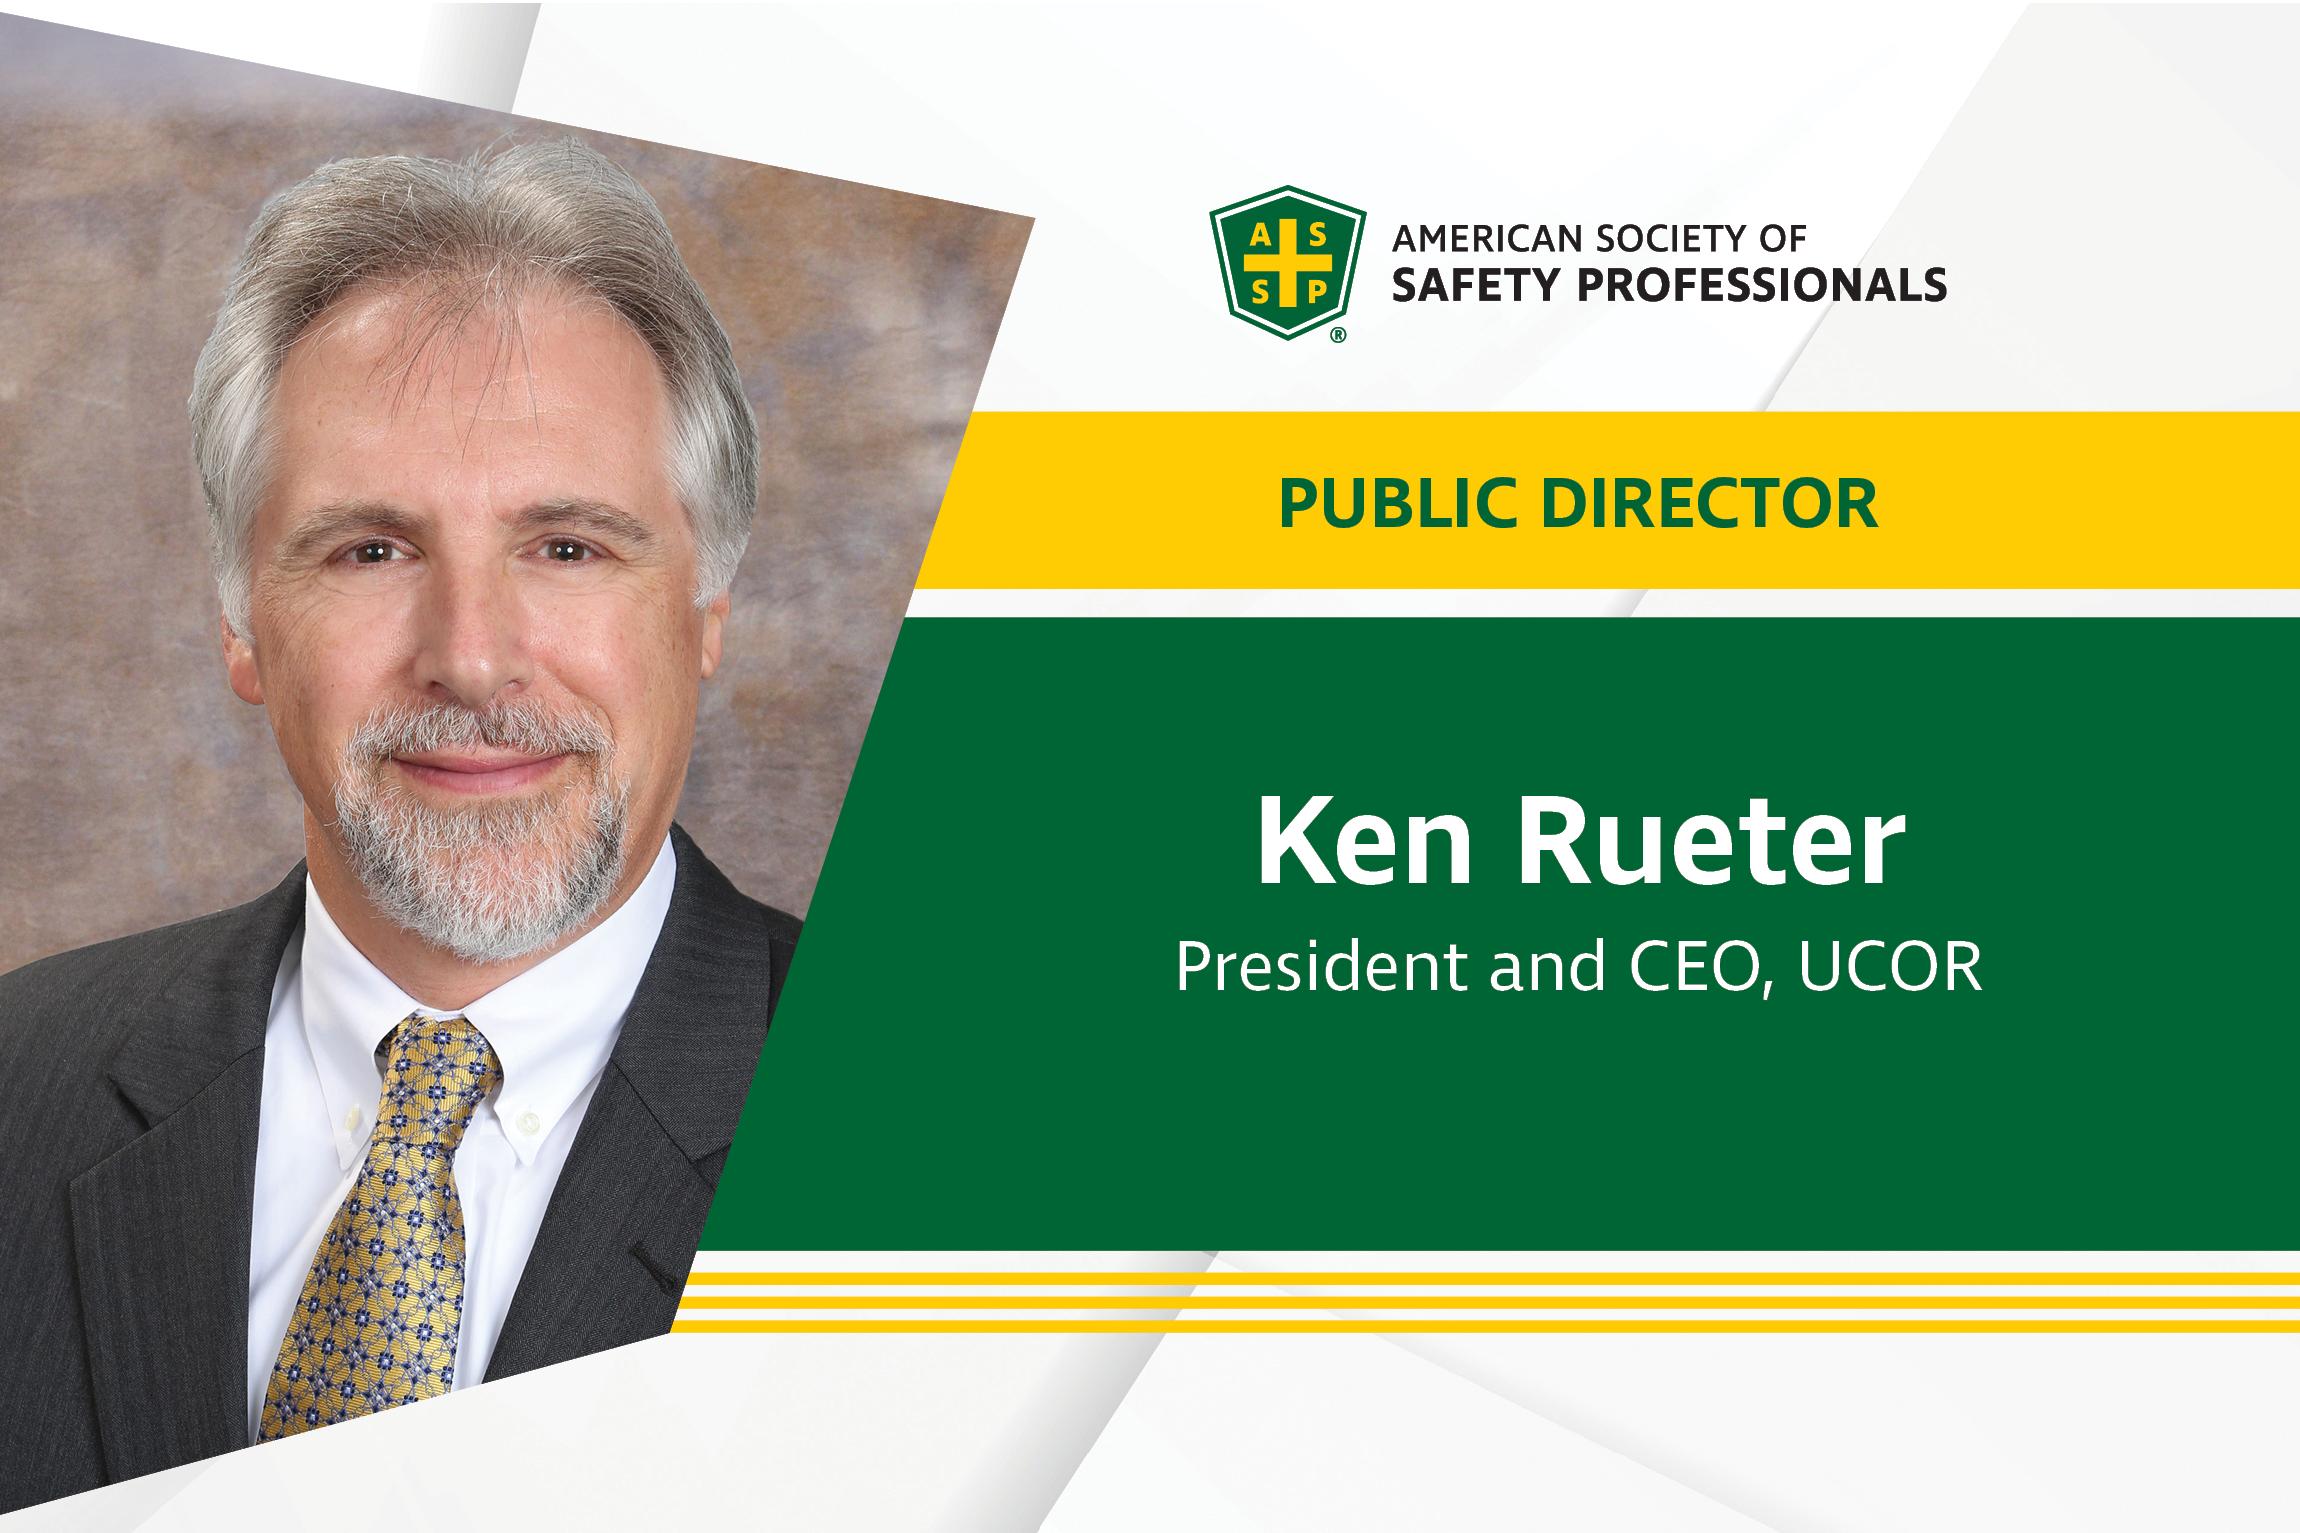 Ken Rueter website